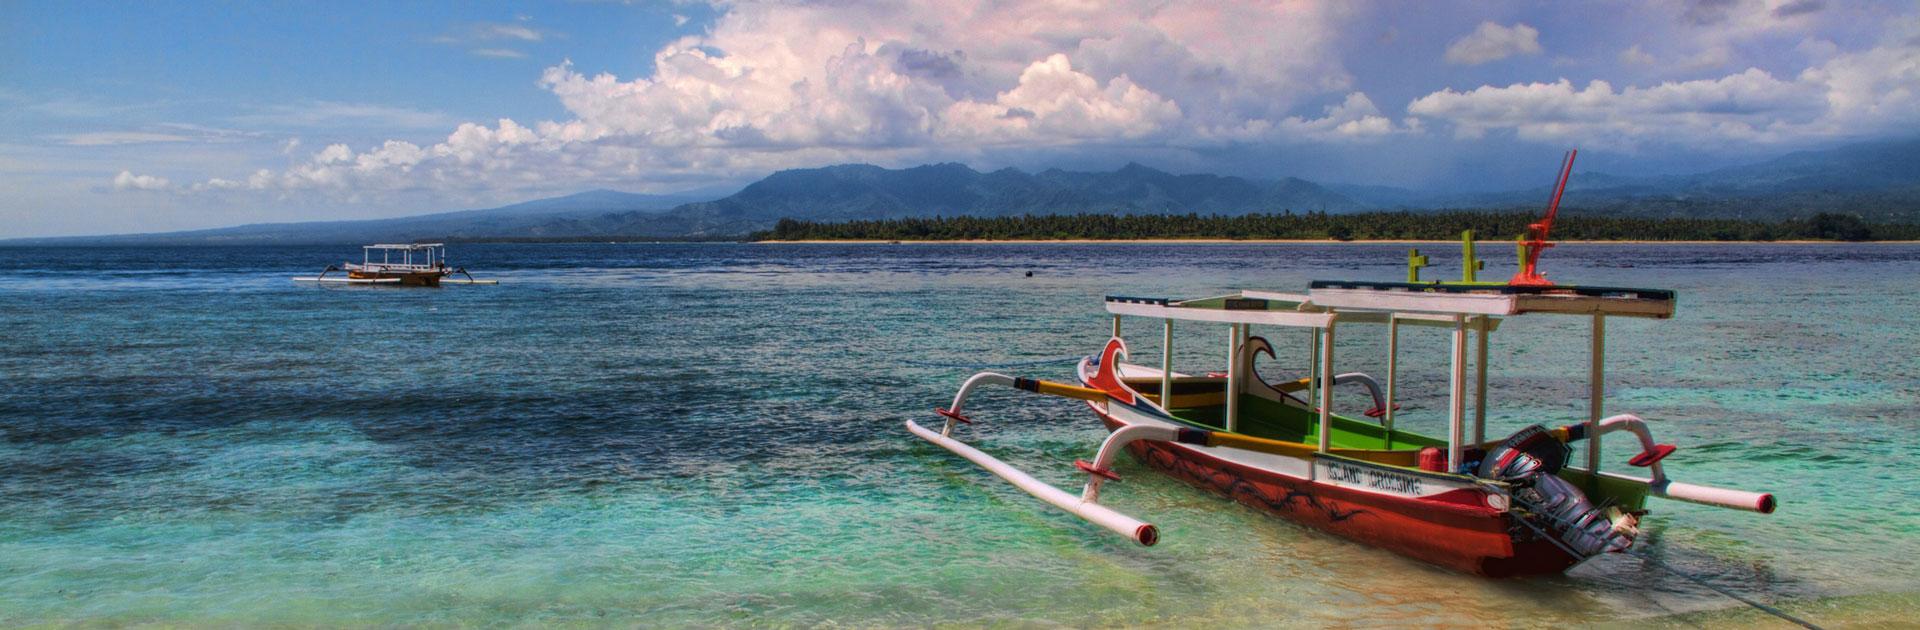 ID Bali Circuito Interior y Gili 3